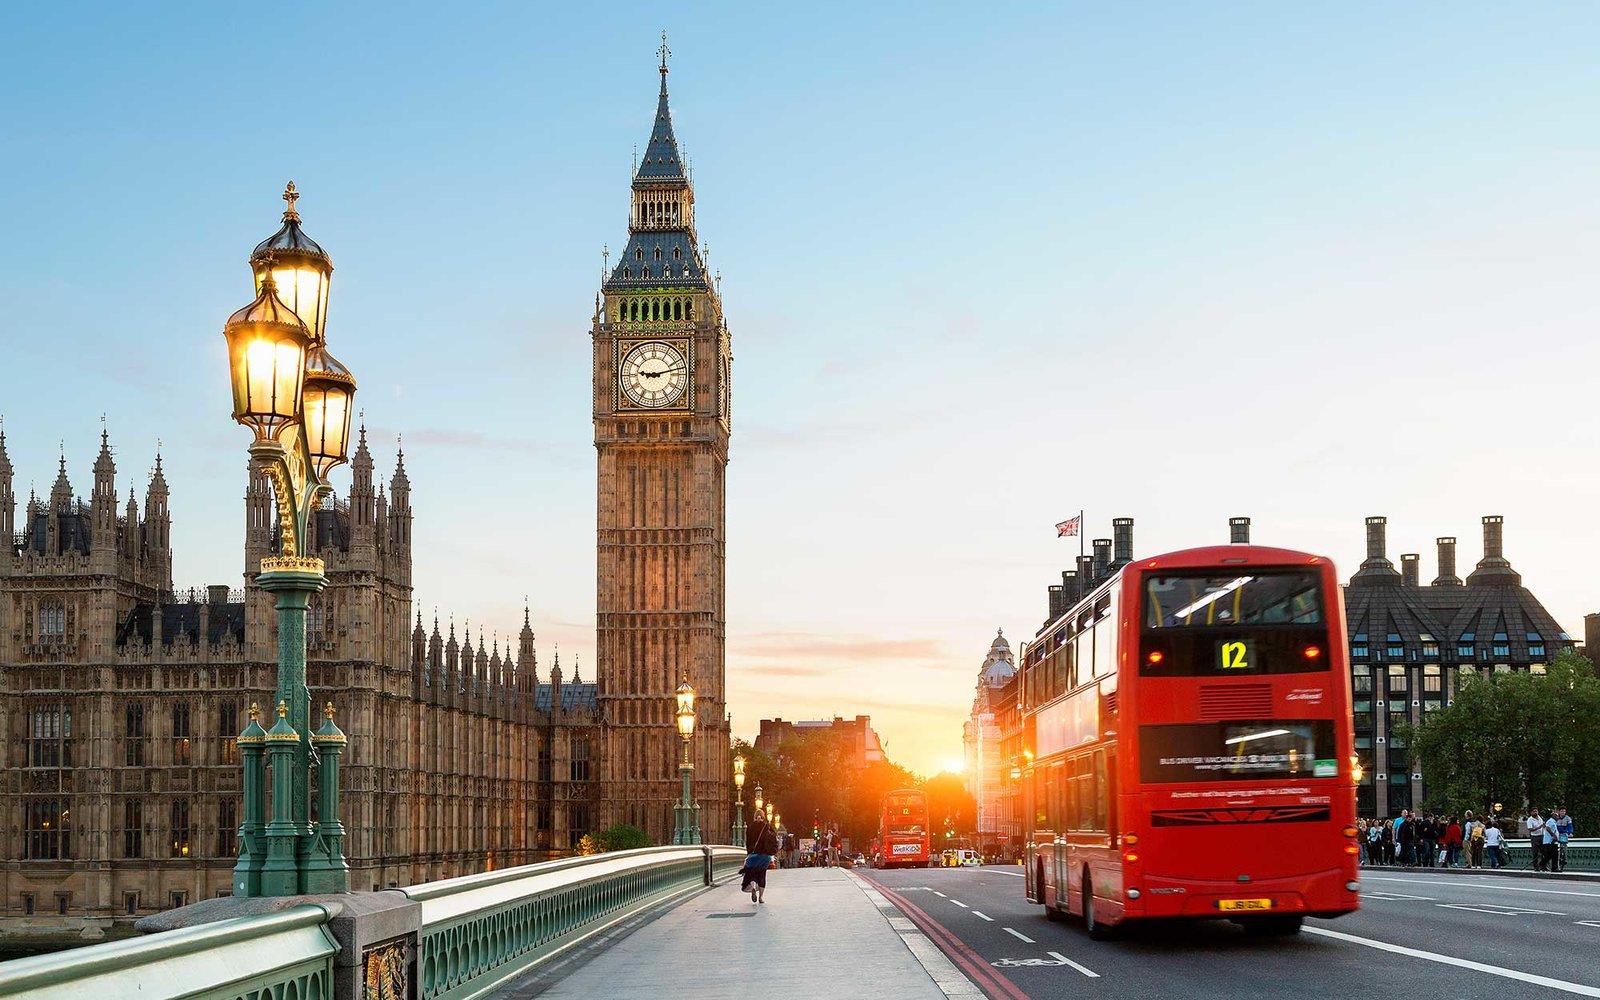 181936 big ben RING0416 - الهجرة إلى بريطانيا بطريقة غير شرعية ومرحلة ما بعد الوصول